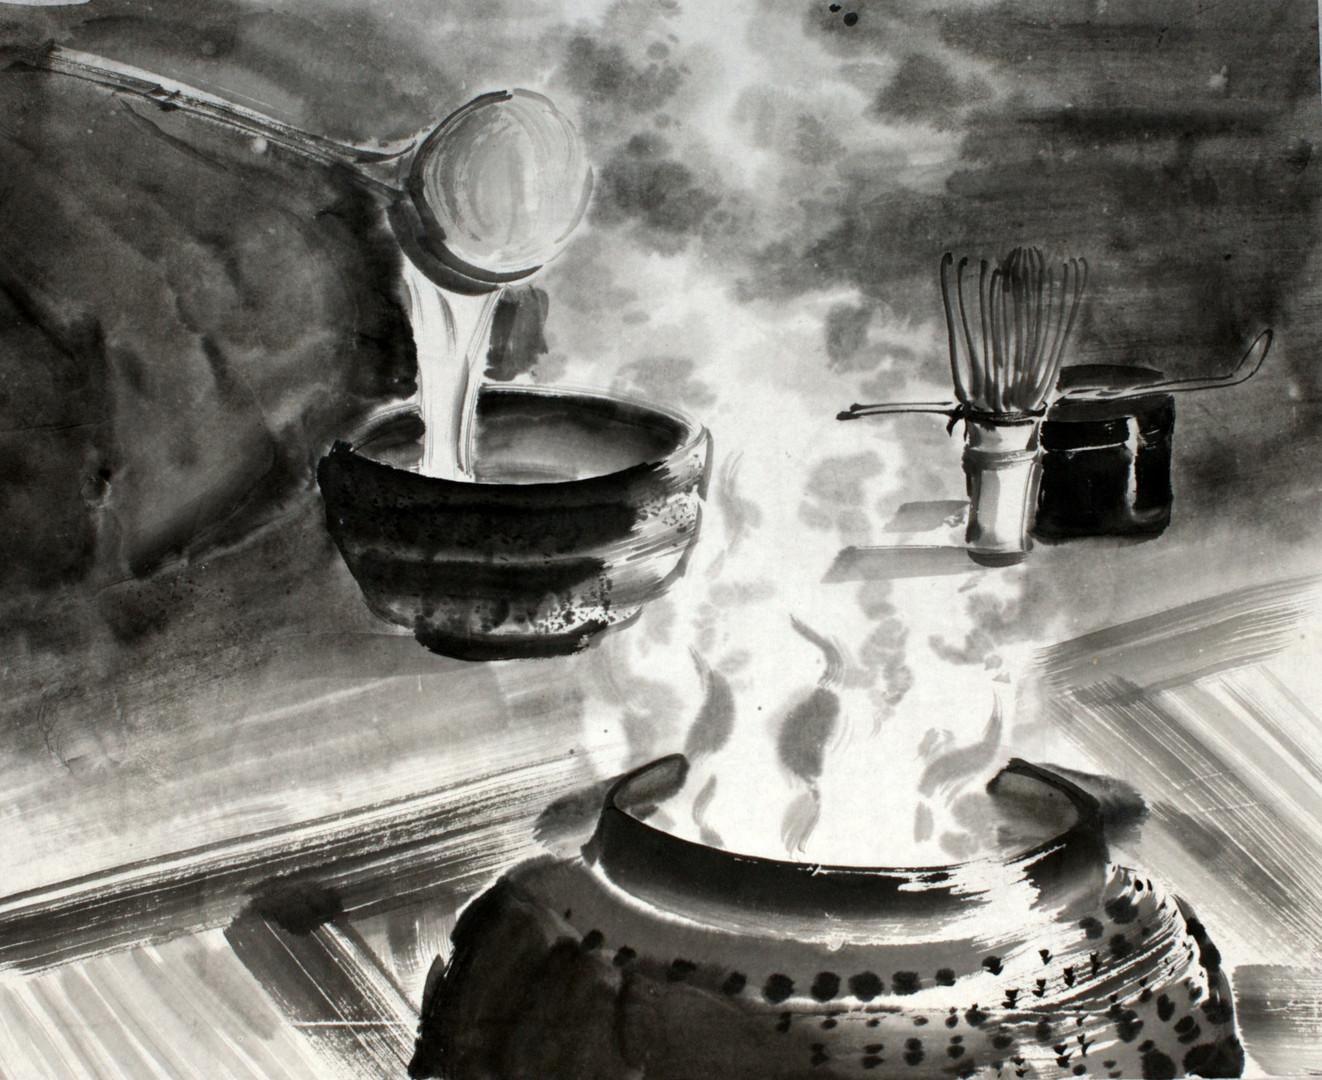 _чайный нятюрморт тепло встречи.jpg